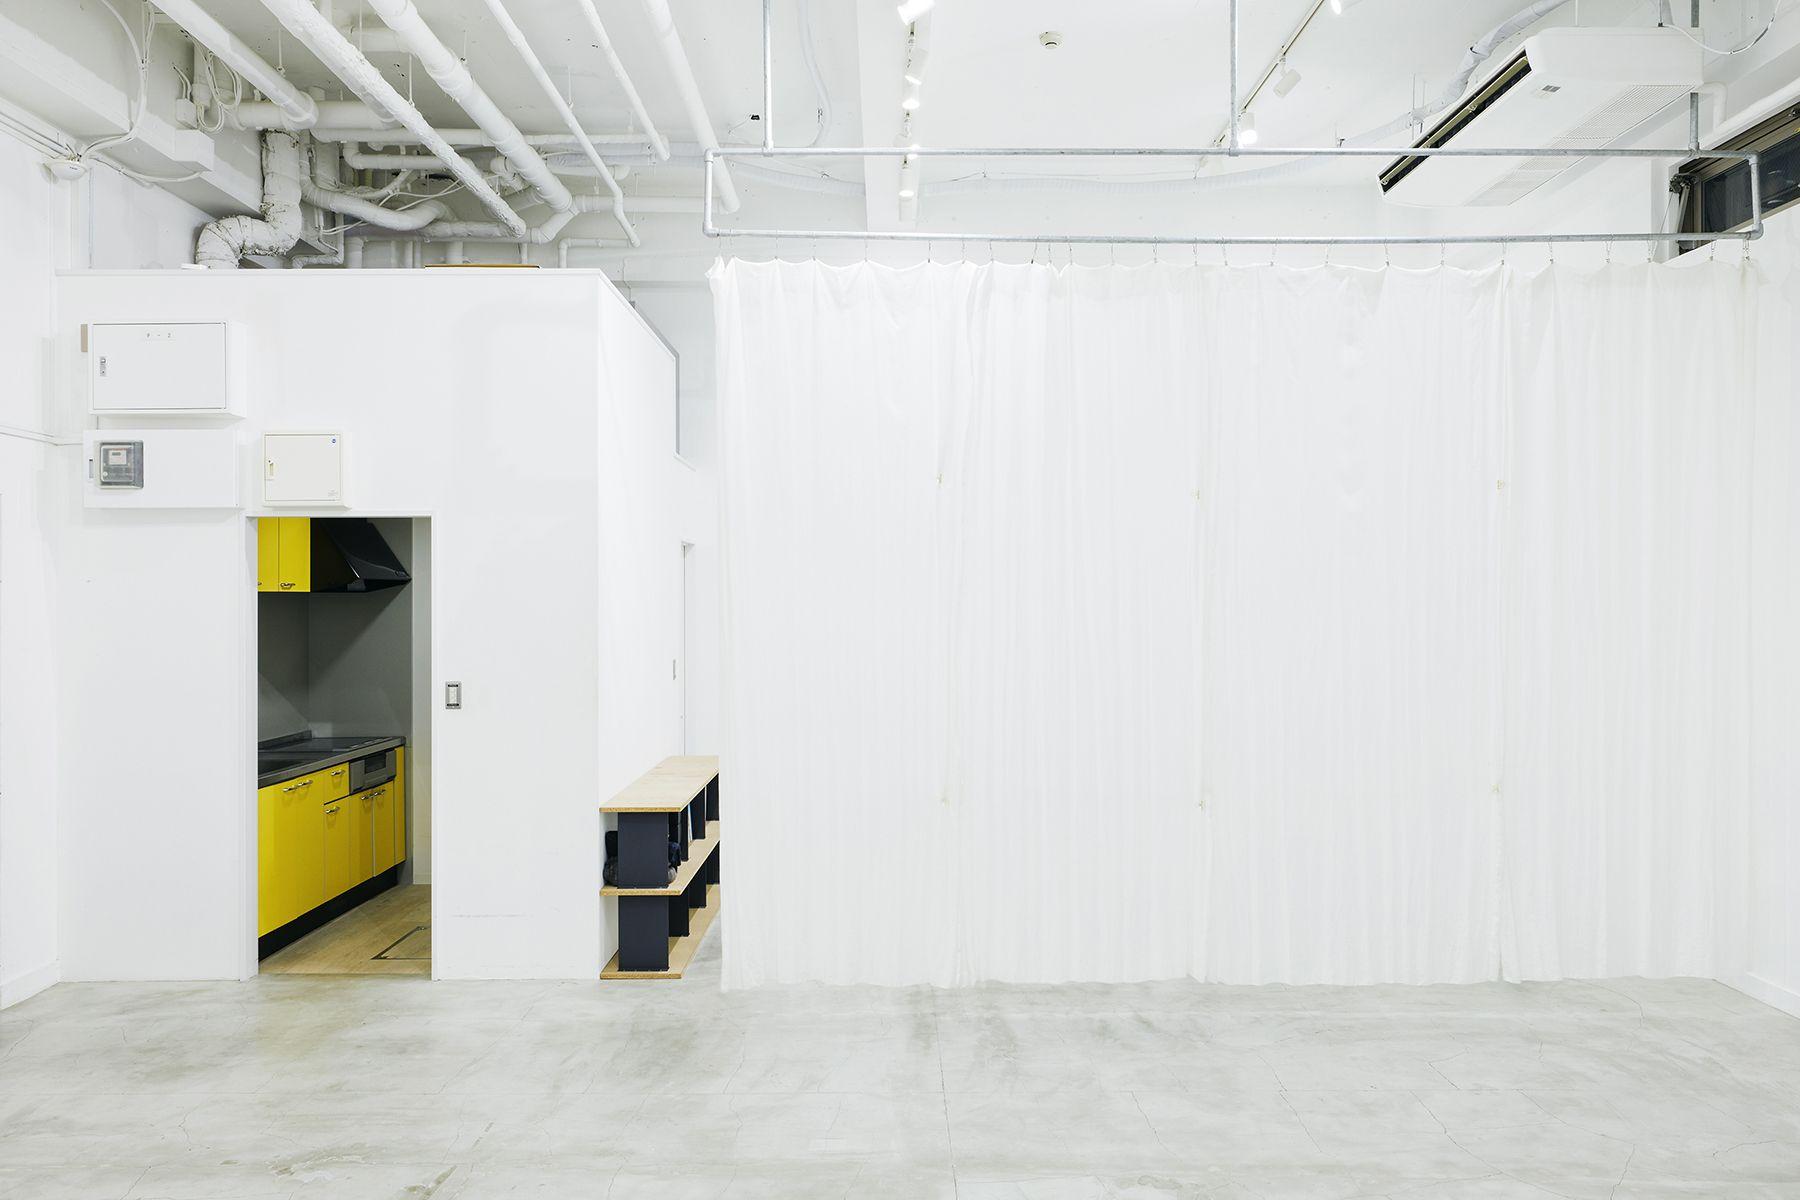 sinca studio 中野坂上 (シンカ スタジオ)カーテンで仕切れます